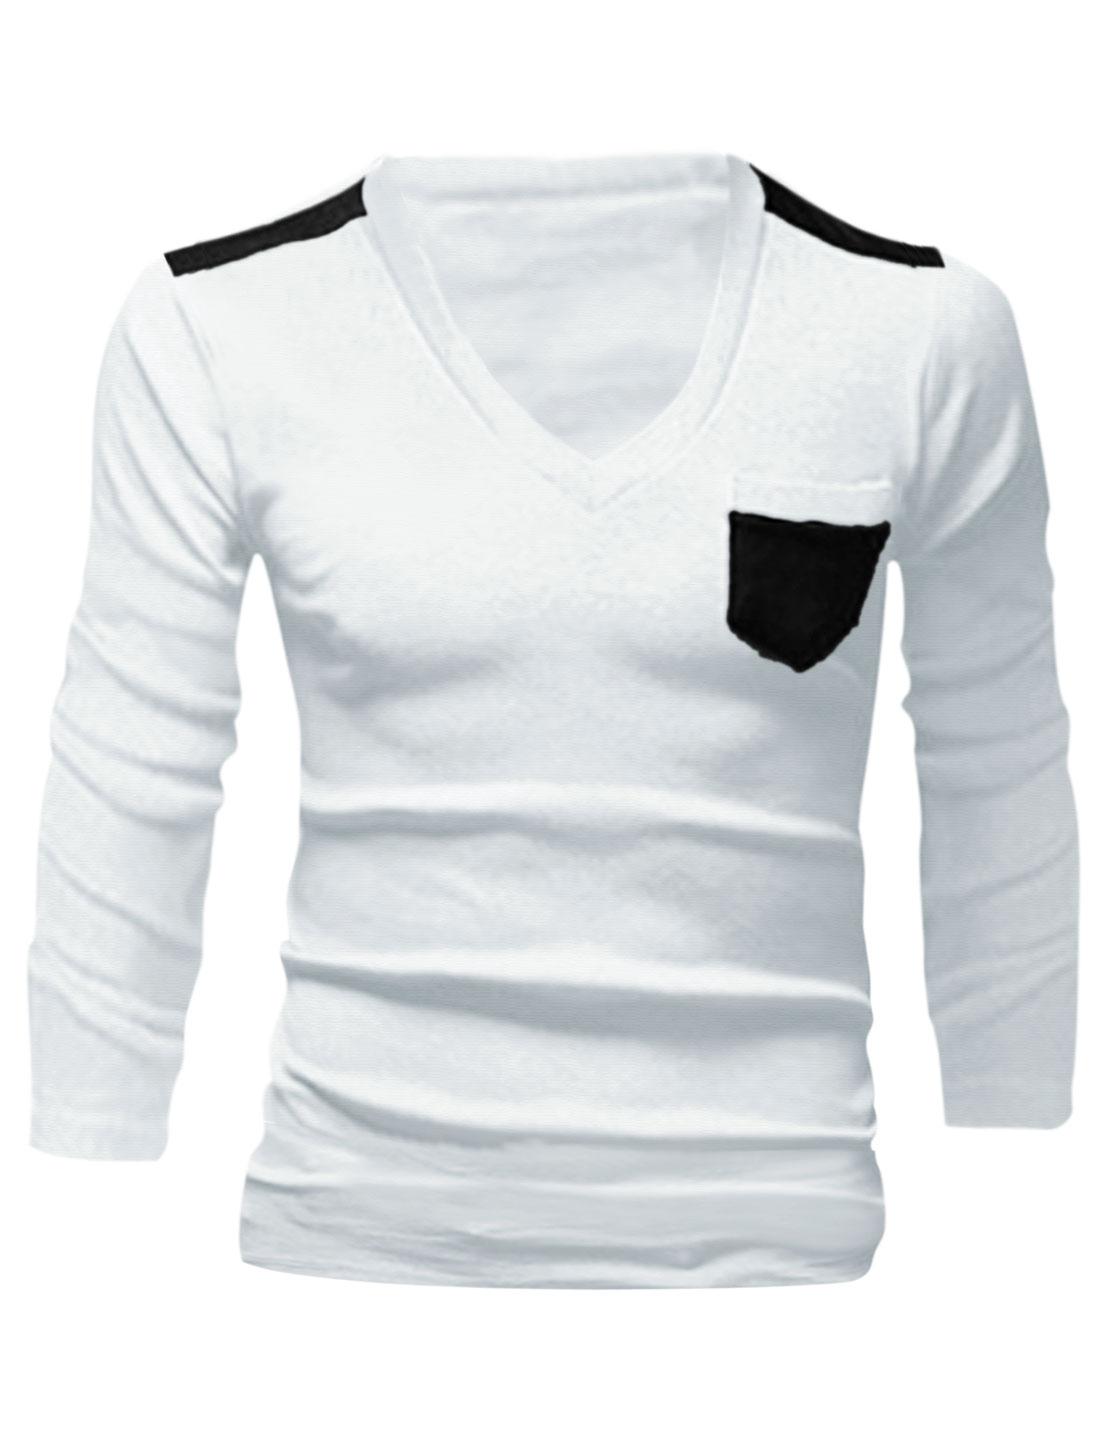 Slim Fit V Neck Fashionable Panel Shirt for Man White M